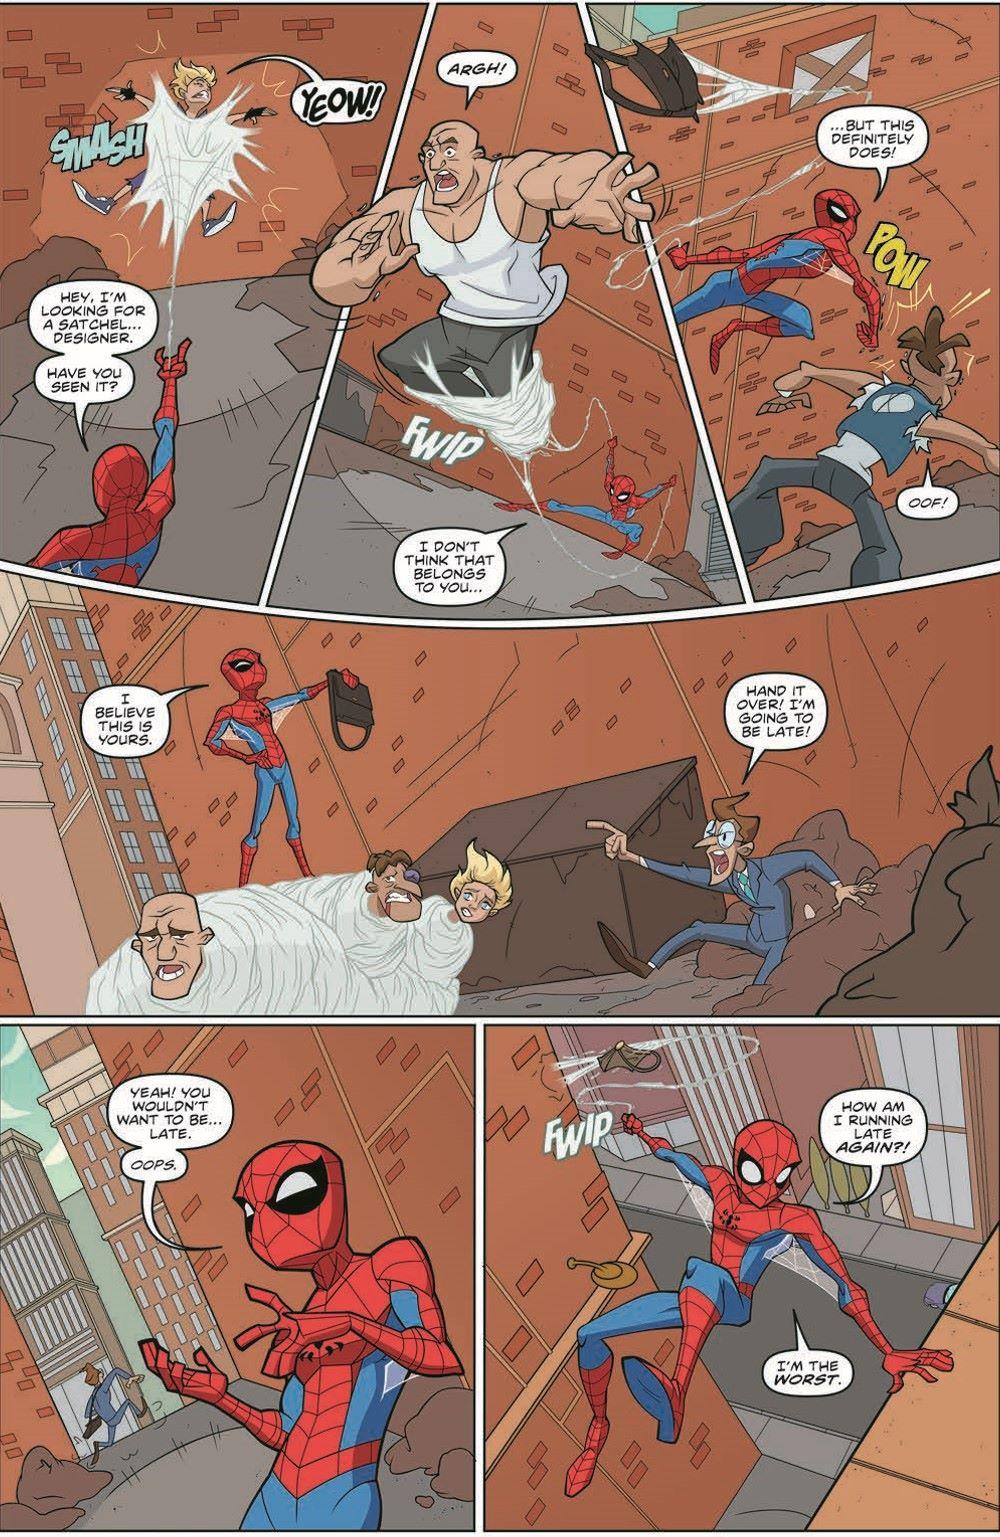 SpidermanV3-01_pr-5 ComicList Previews: MARVEL ACTION SPIDER-MAN VOLUME 3 #1